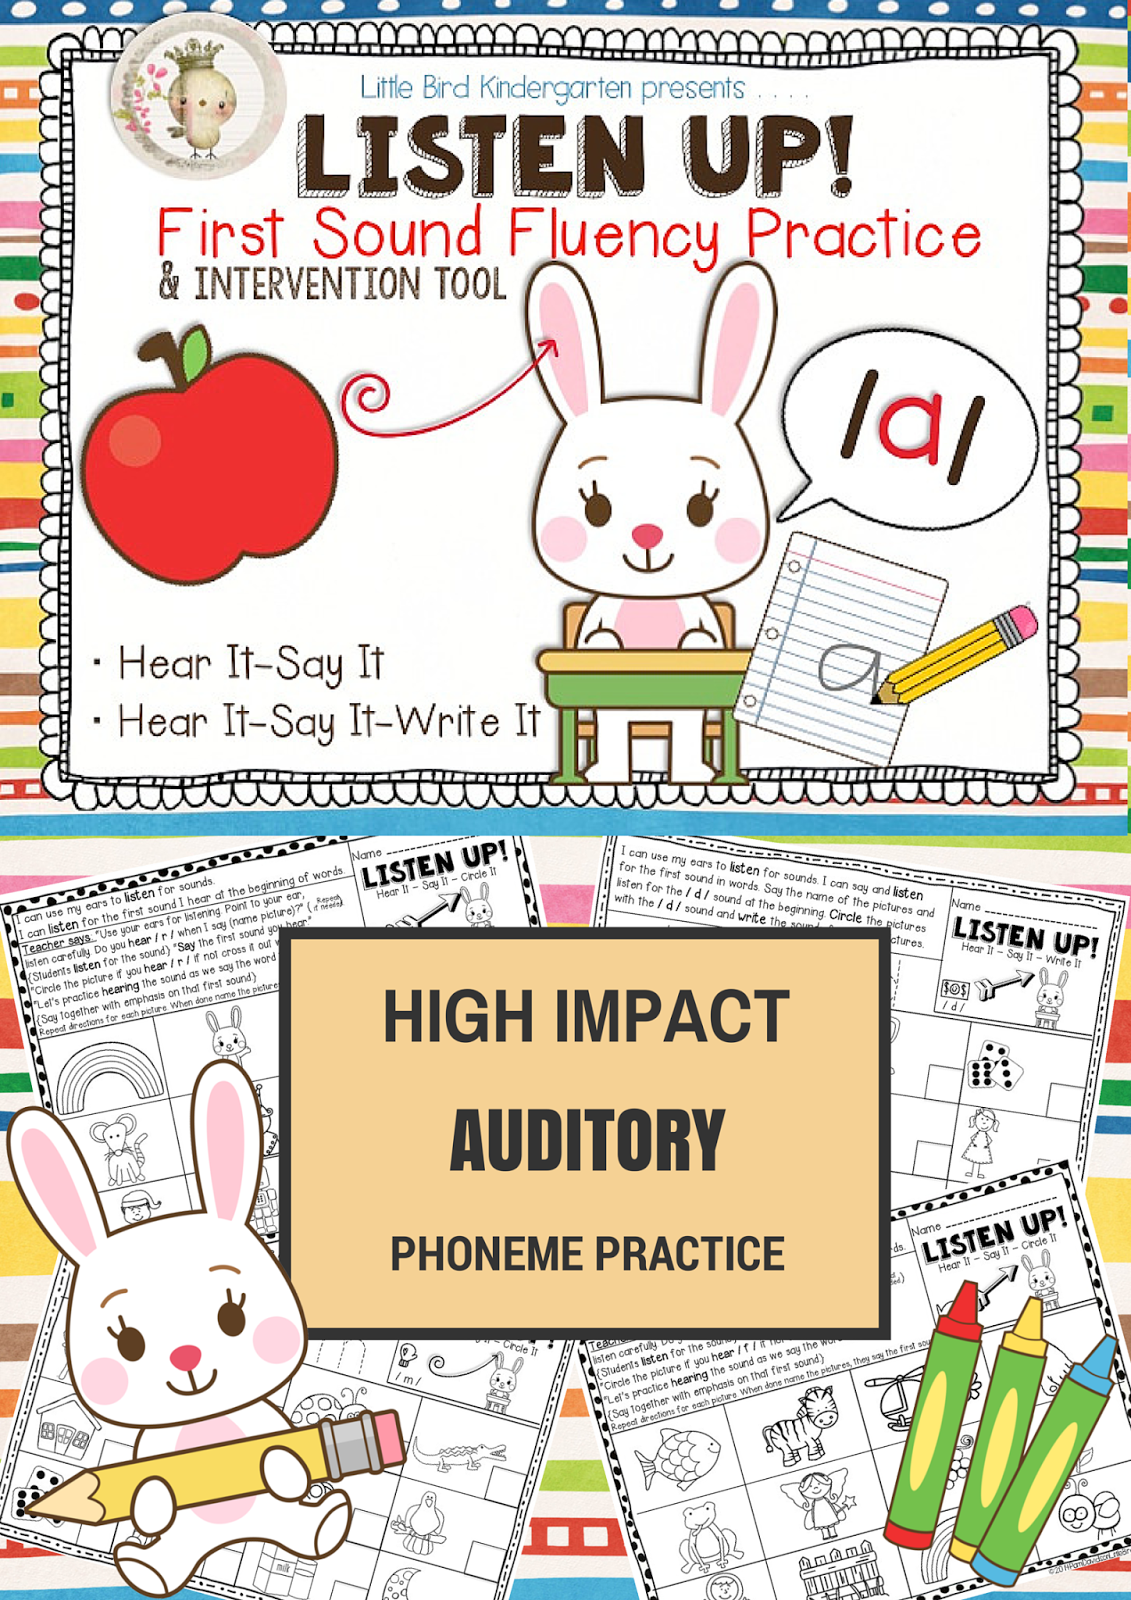 Little Bird Kindergarten: Search results for listen up | Activities ...